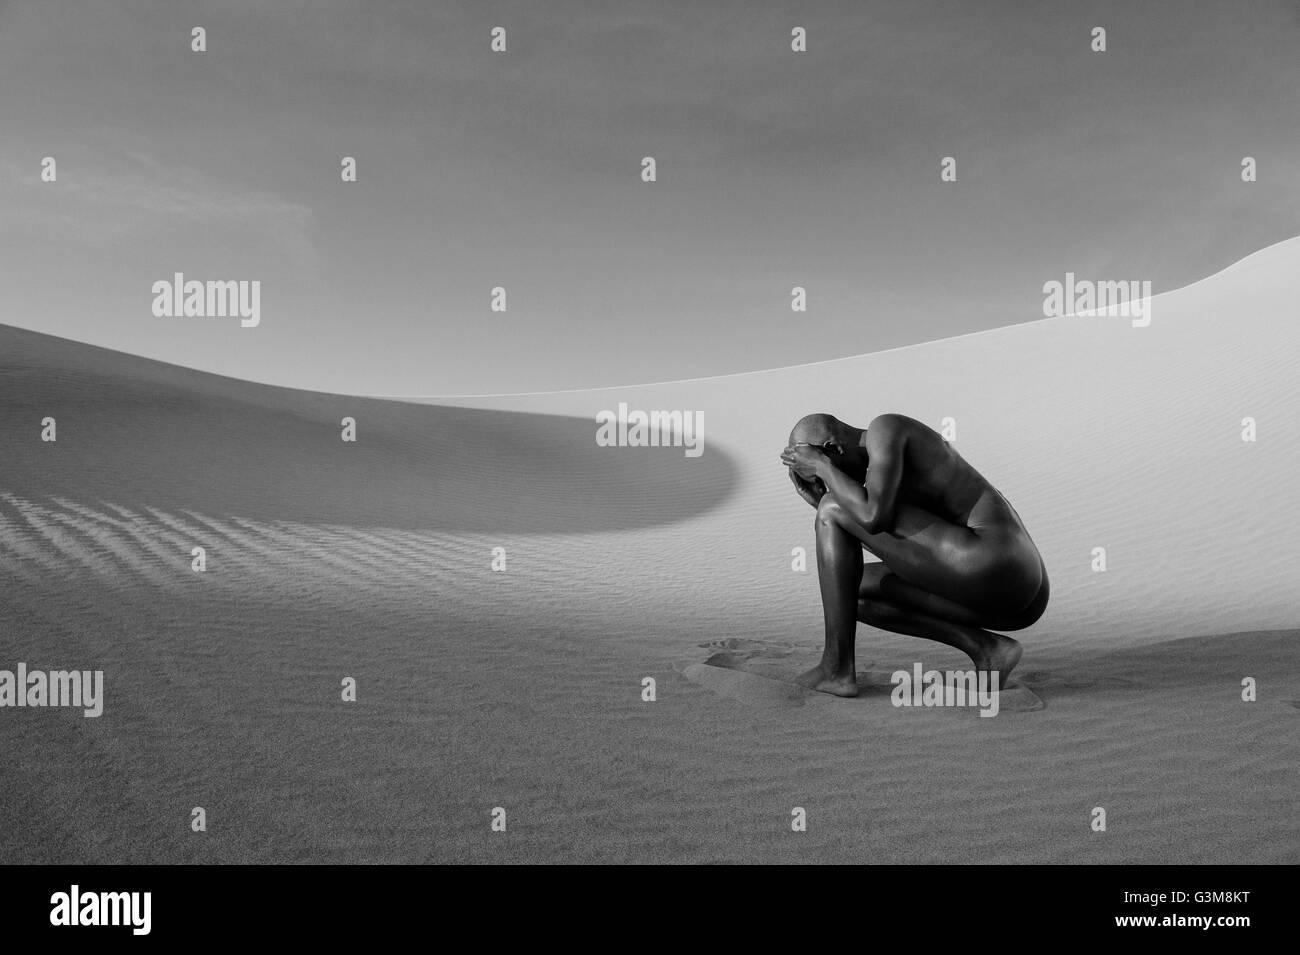 Nude woman cowering in desert - Stock Image